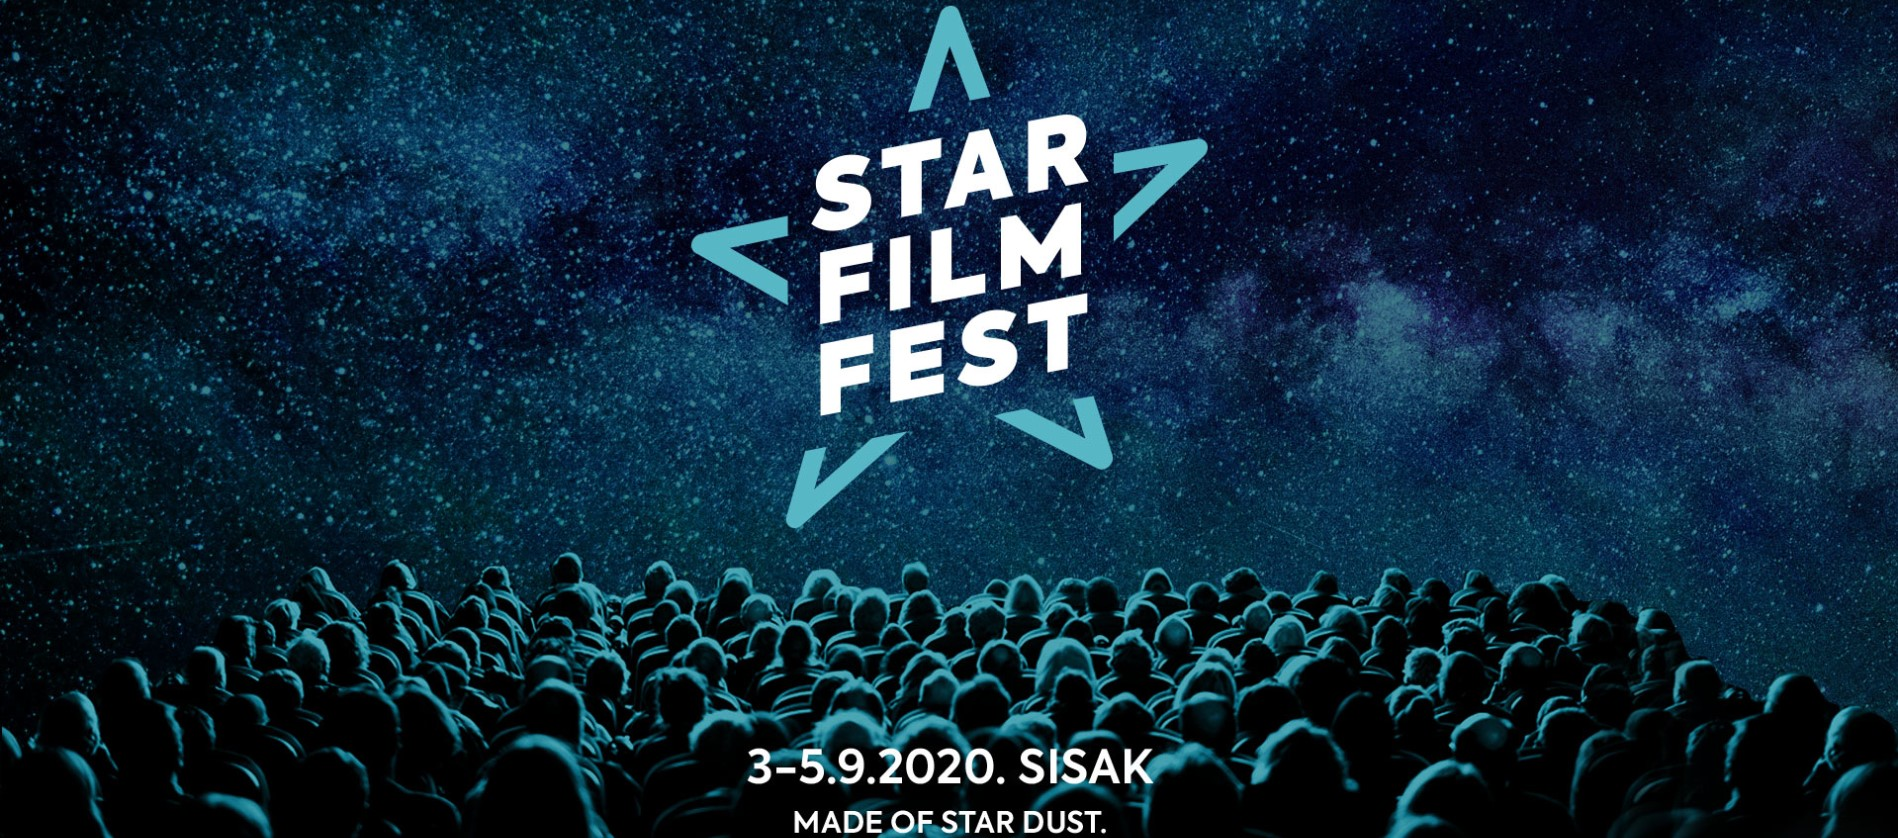 Konkurs Star Film Festa u Sisku